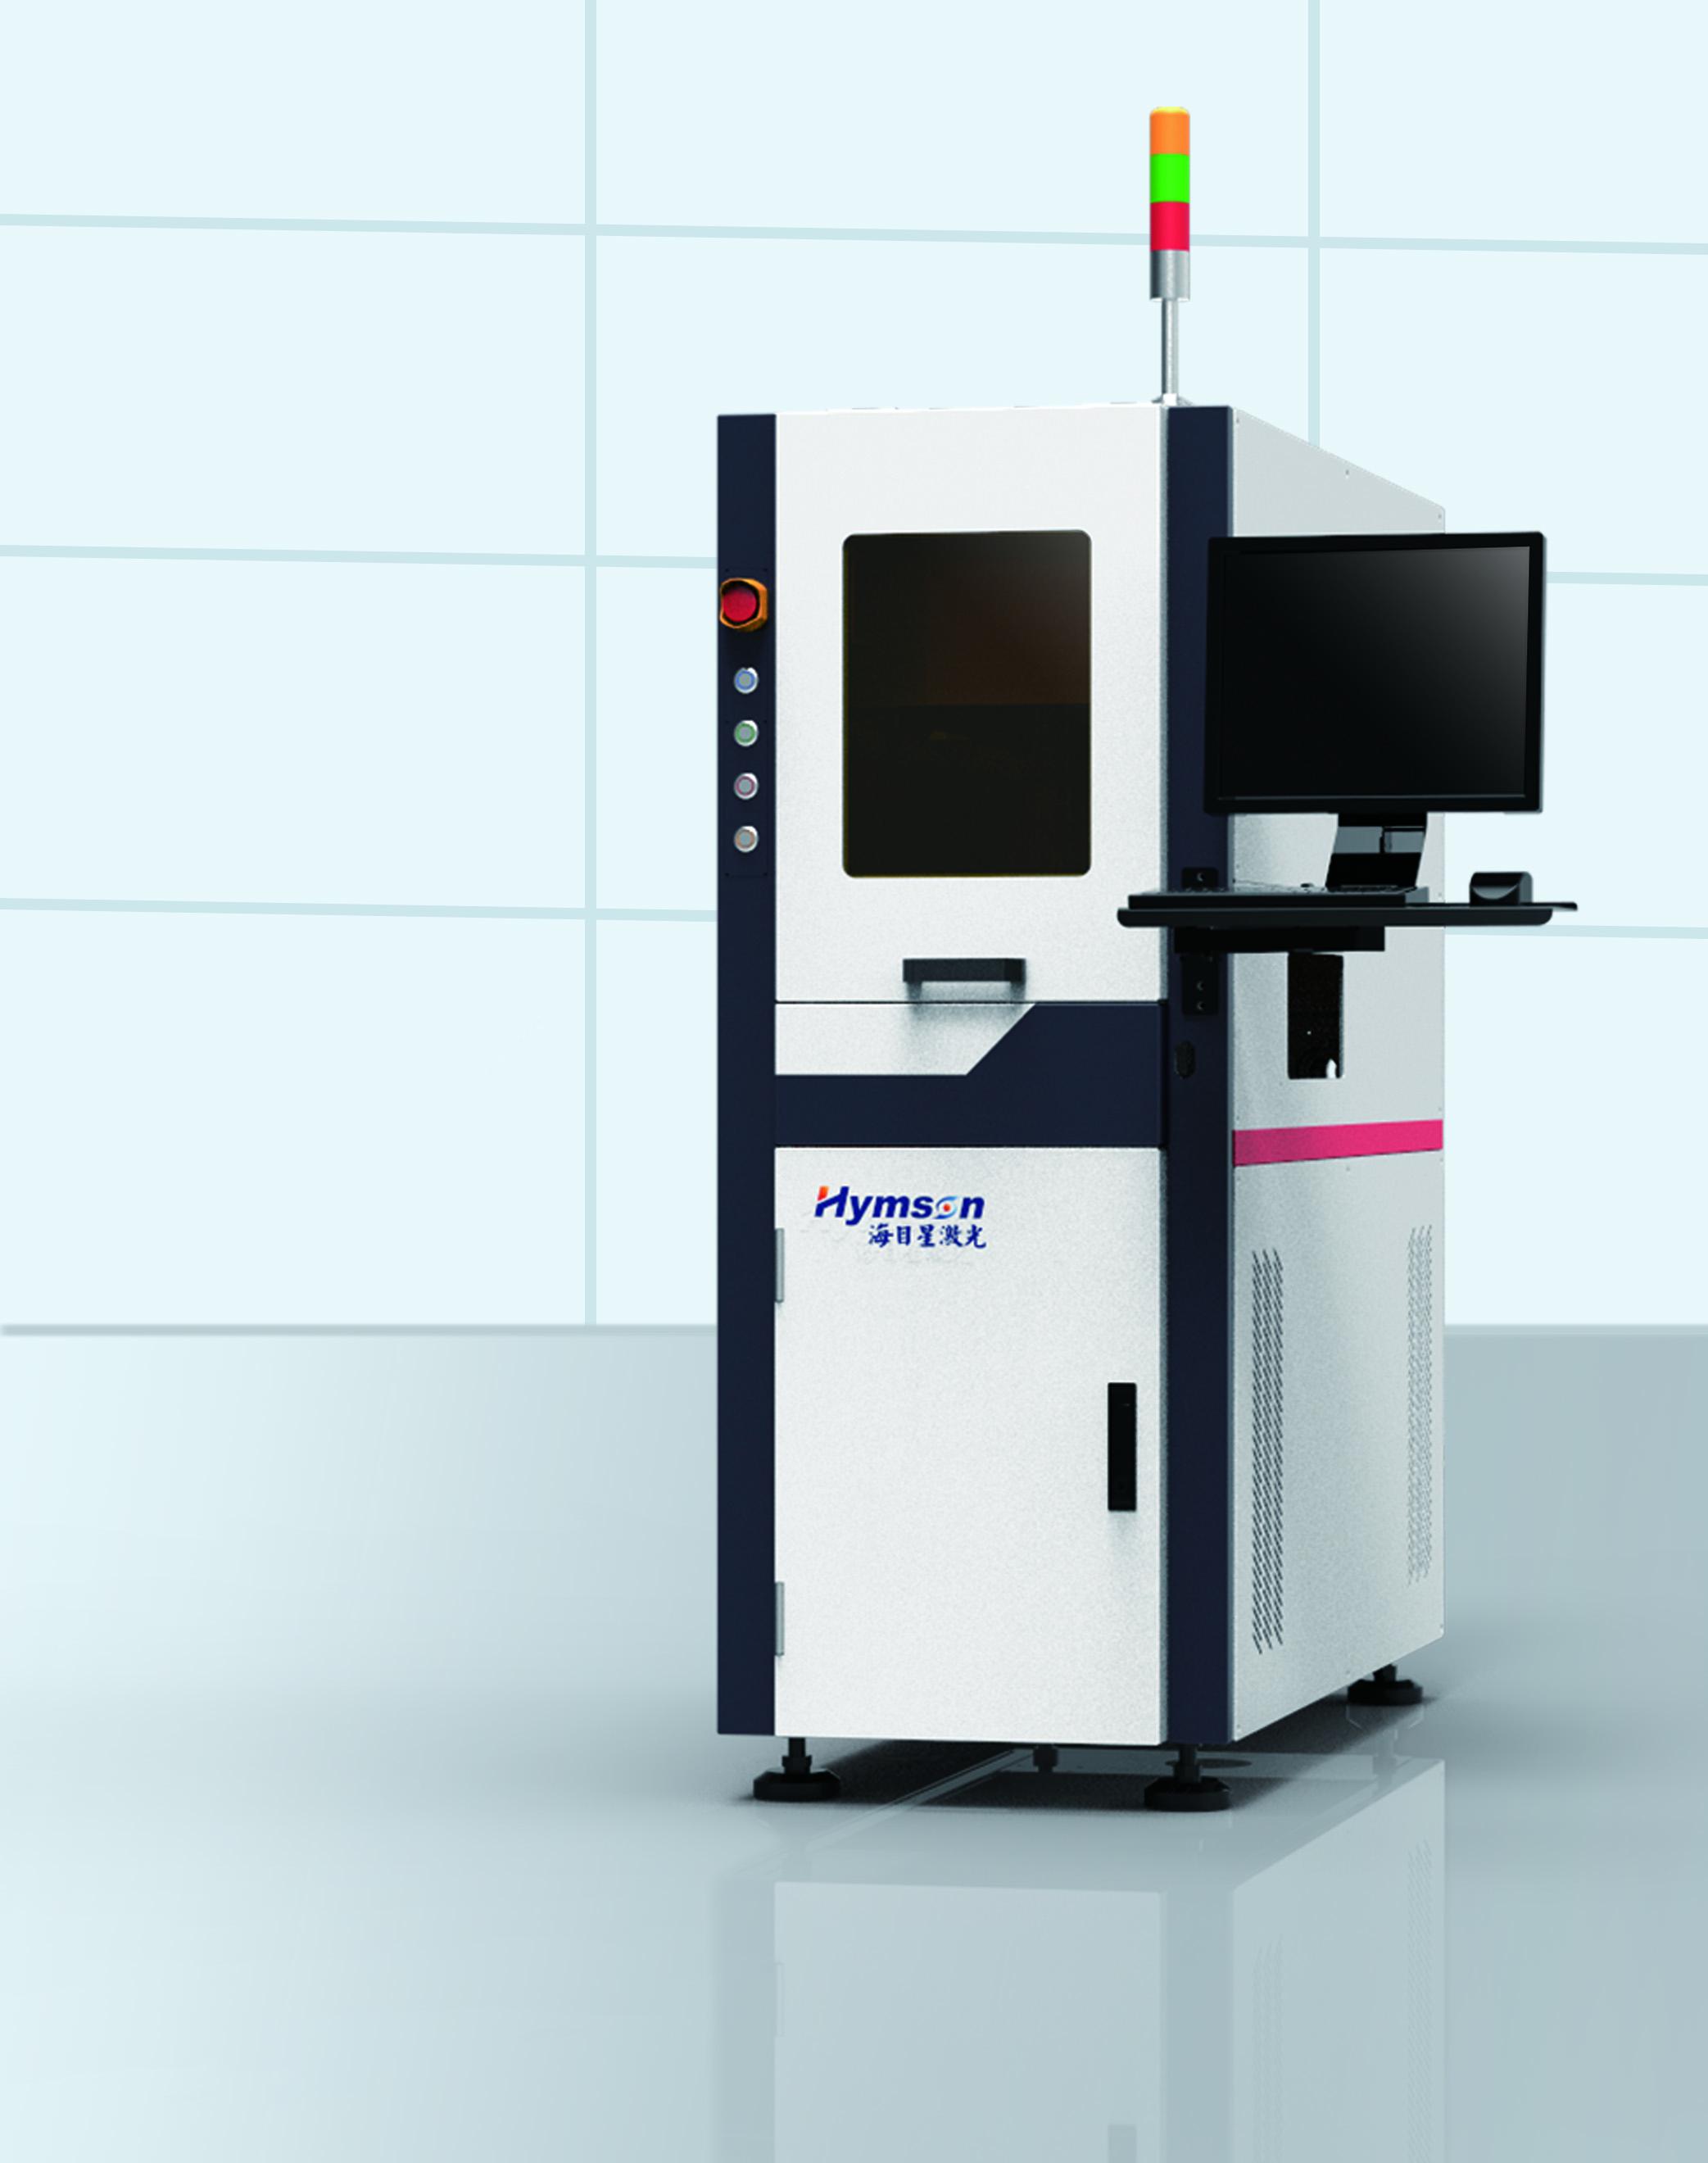 Hymson HYM-P4 全自动内置翻板PCB 激光打标机